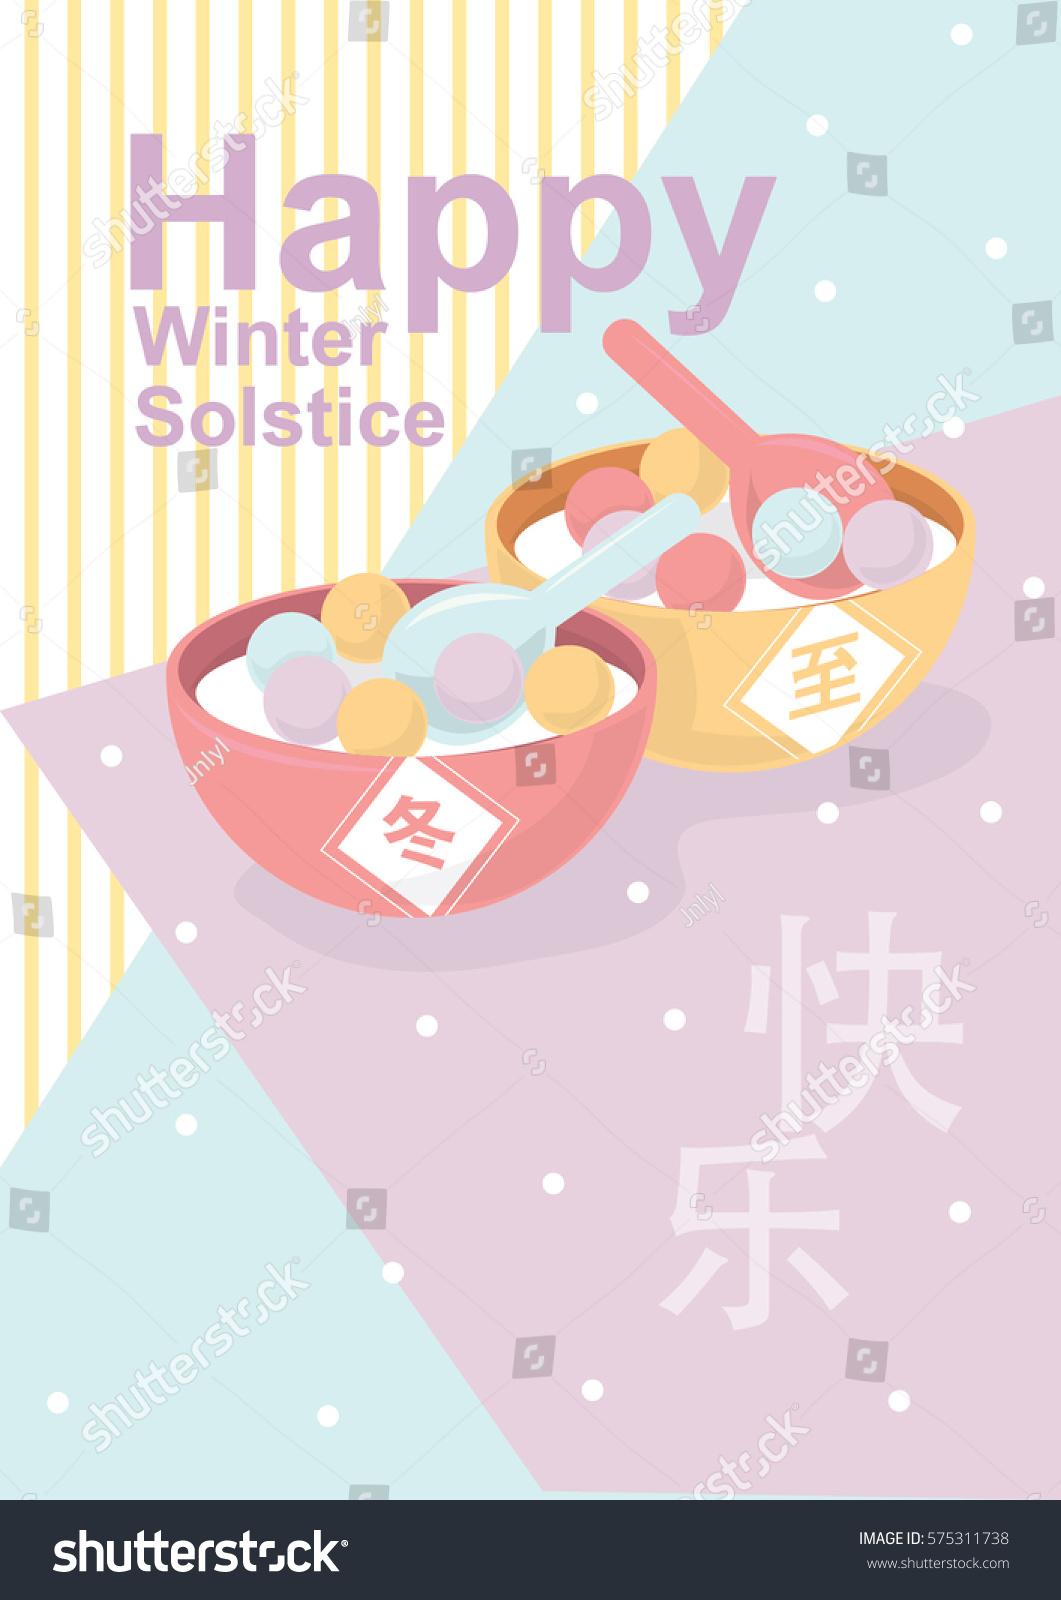 Happy Winter Solstice Poster Design Translation Stock Vector